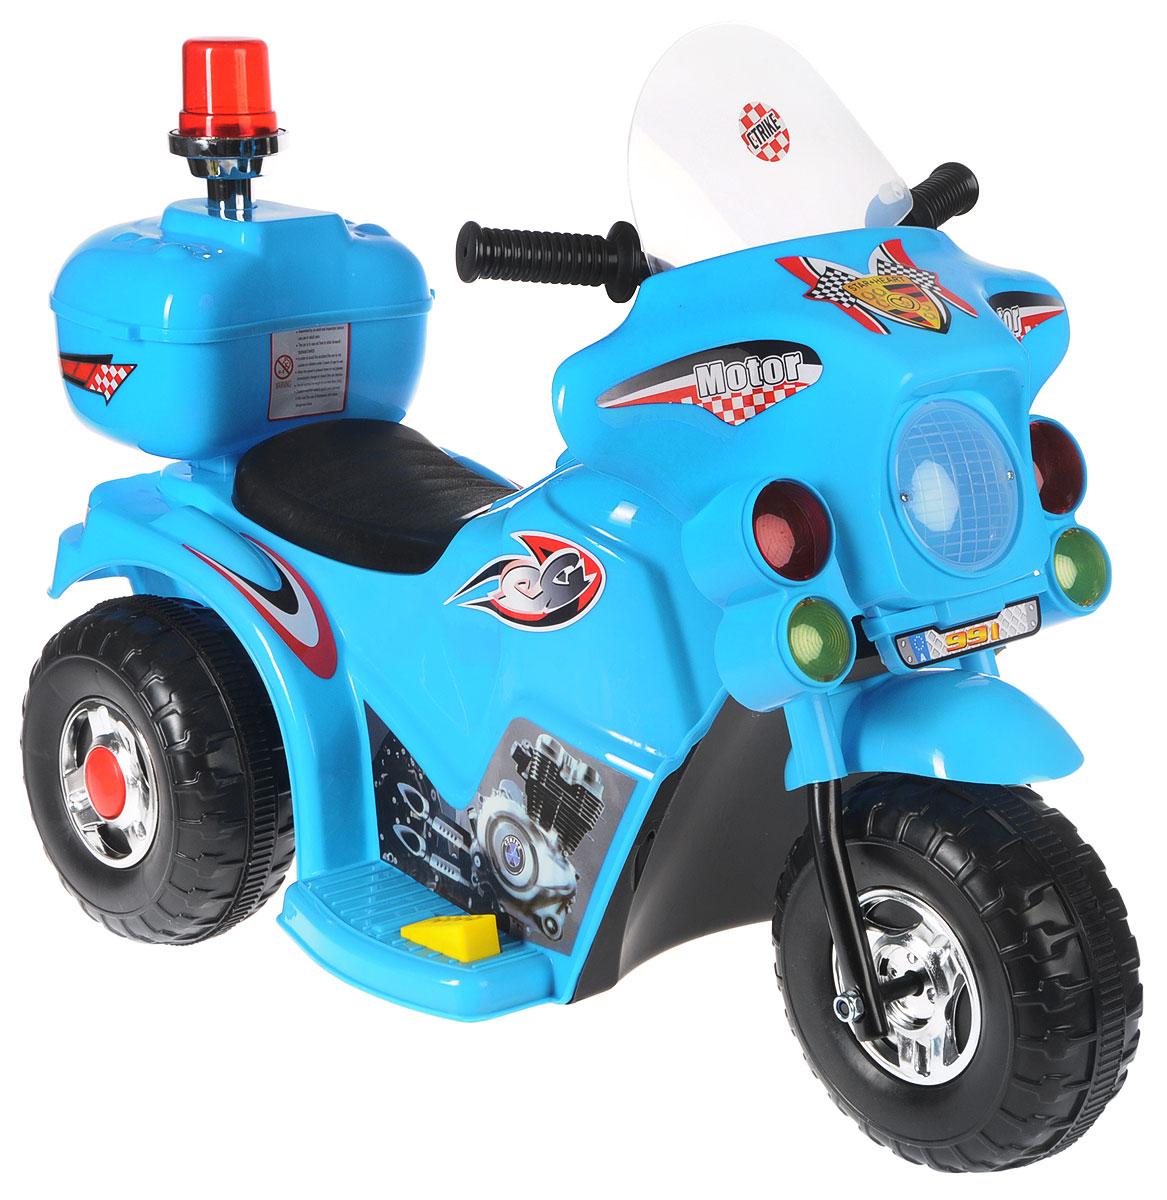 G120 Мотоцикл детский на аккумуляторе с маячком 1004672